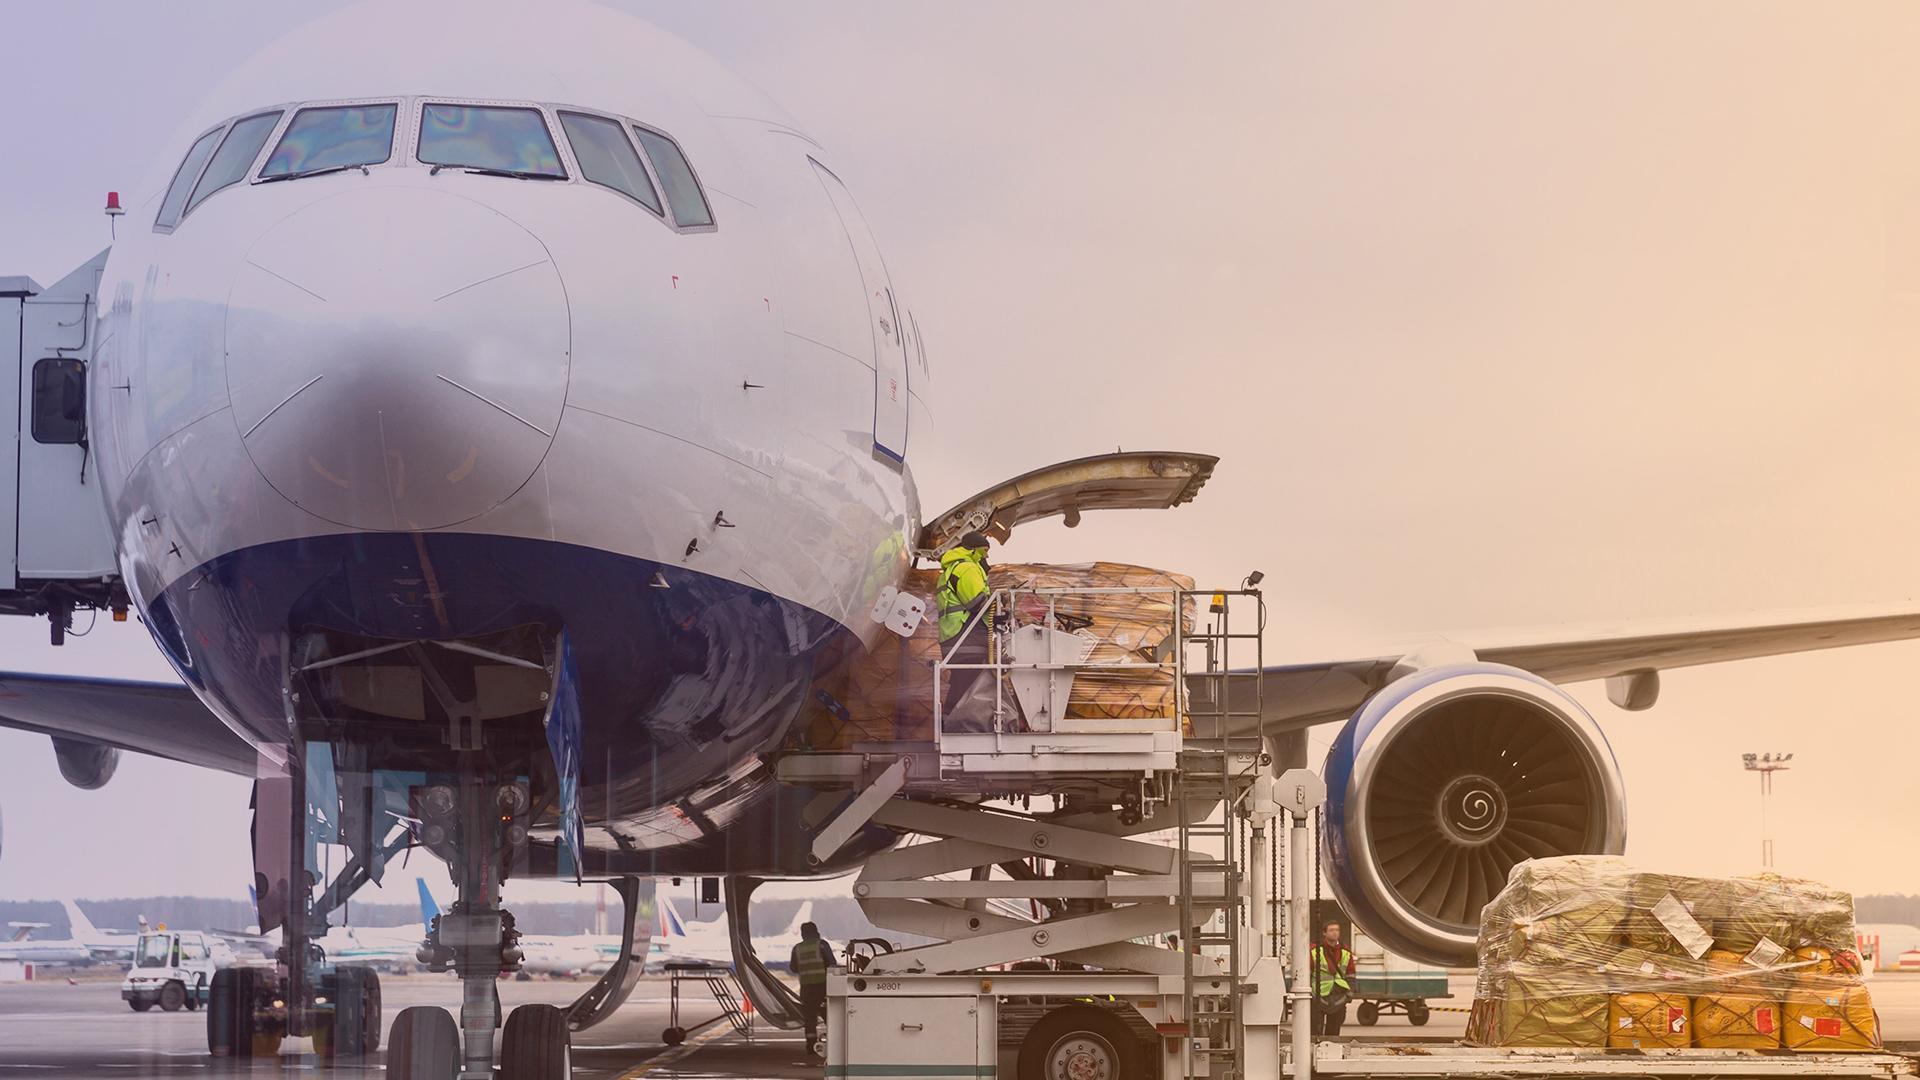 The Central Eastern European air cargo specialist